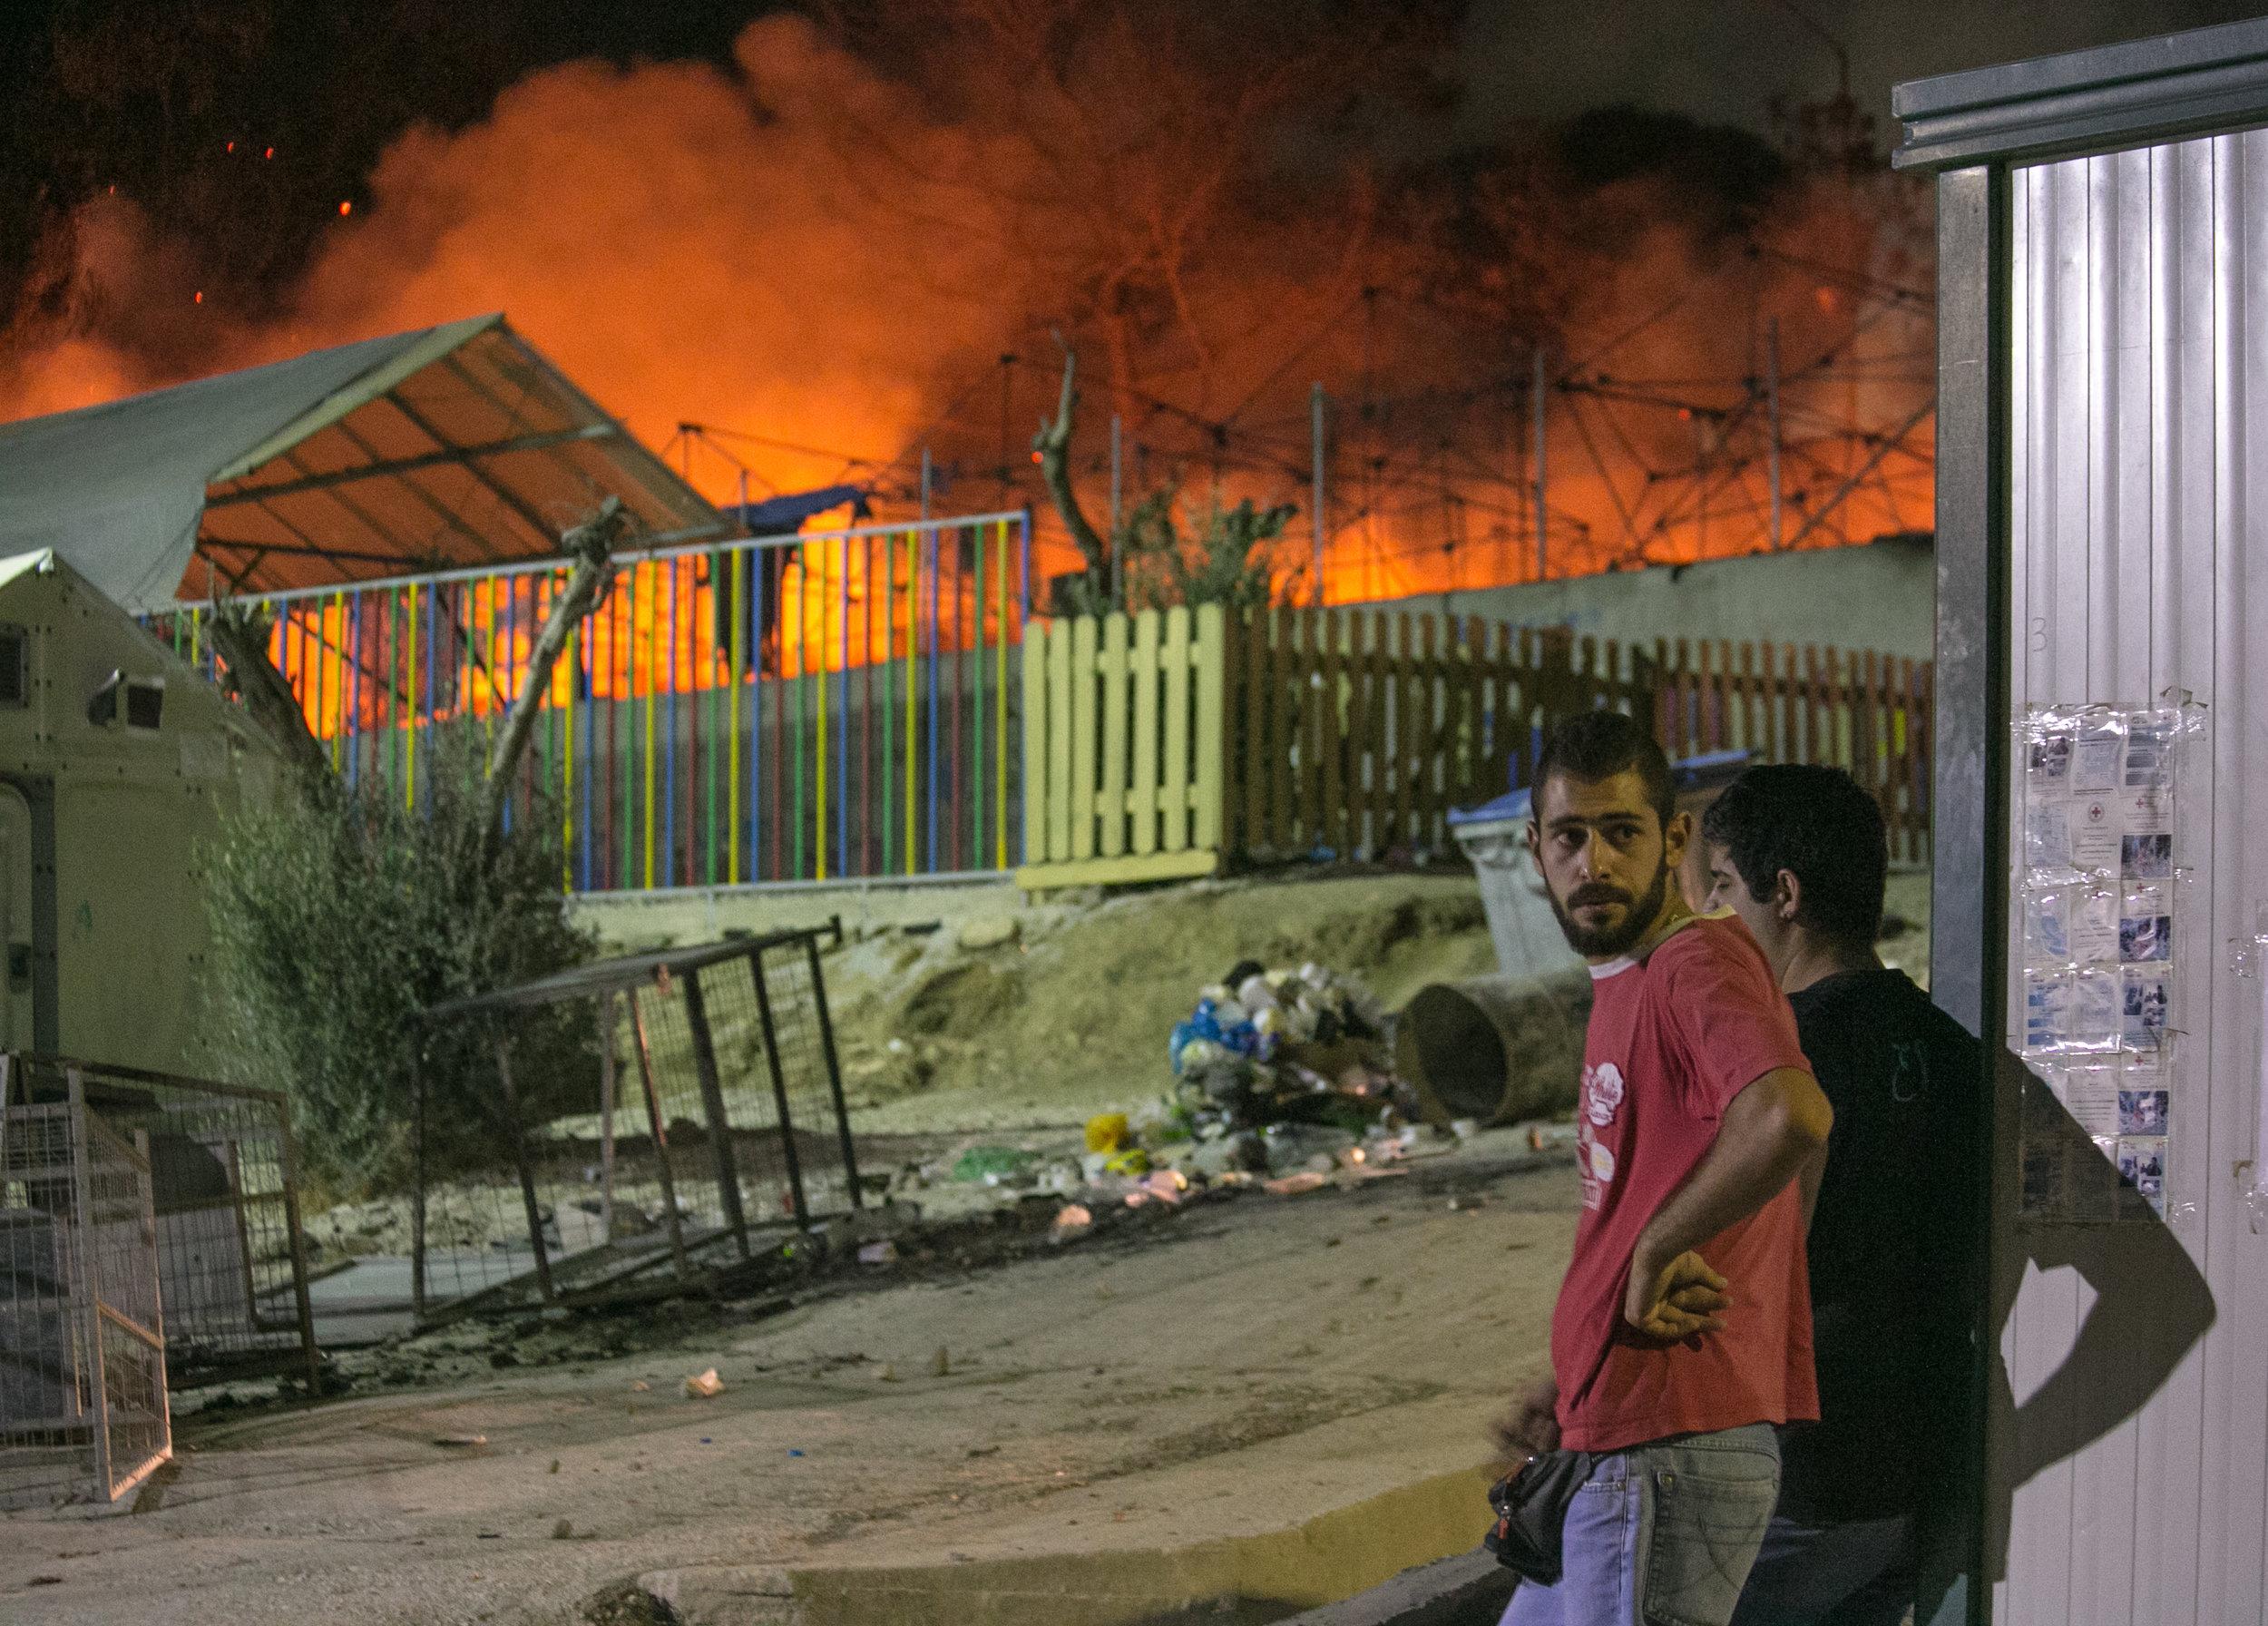 09/19/16 - Moria Refugee Camp Riot Coverage - AP - Lesvos, Greece